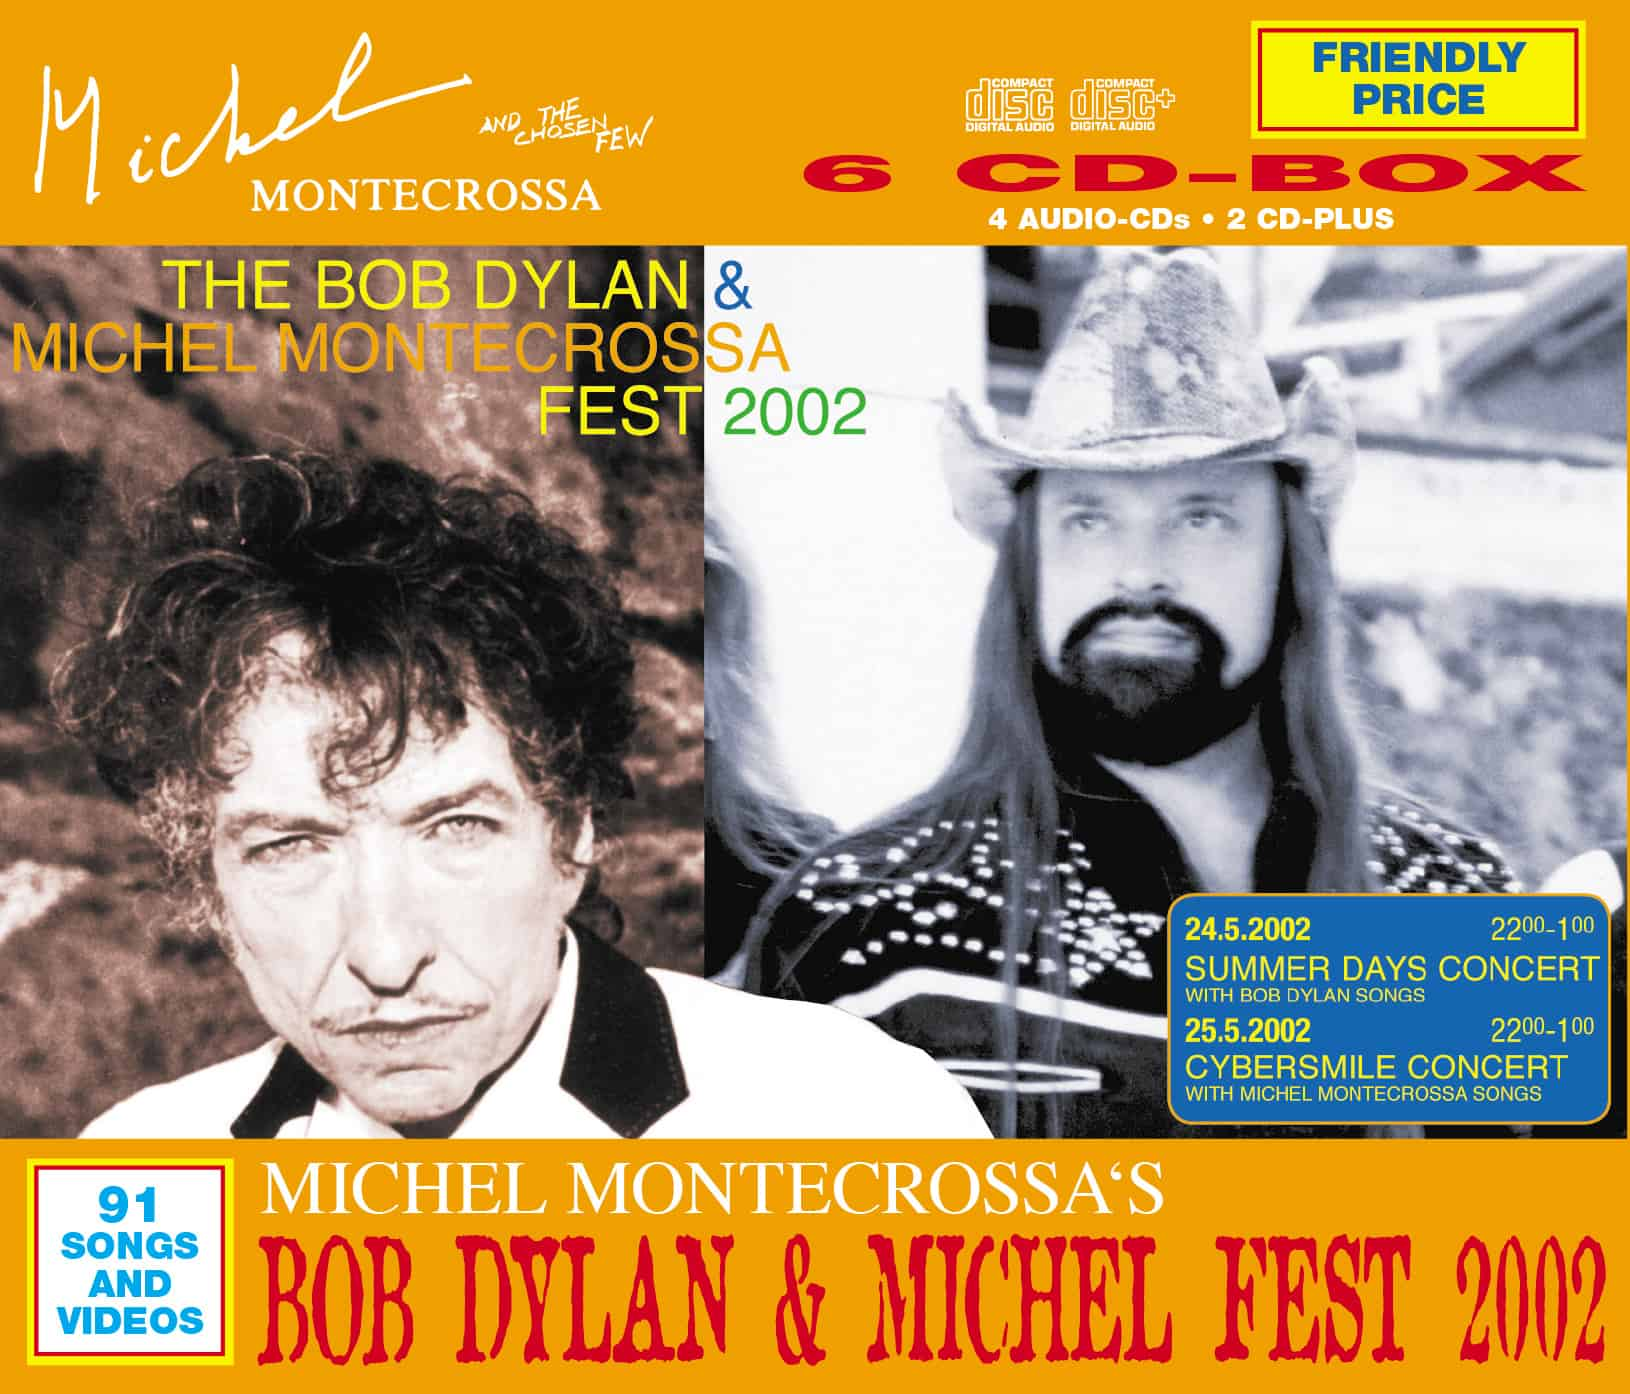 Michel Montecrossa's Bob Dylan & Michel Fest 2002